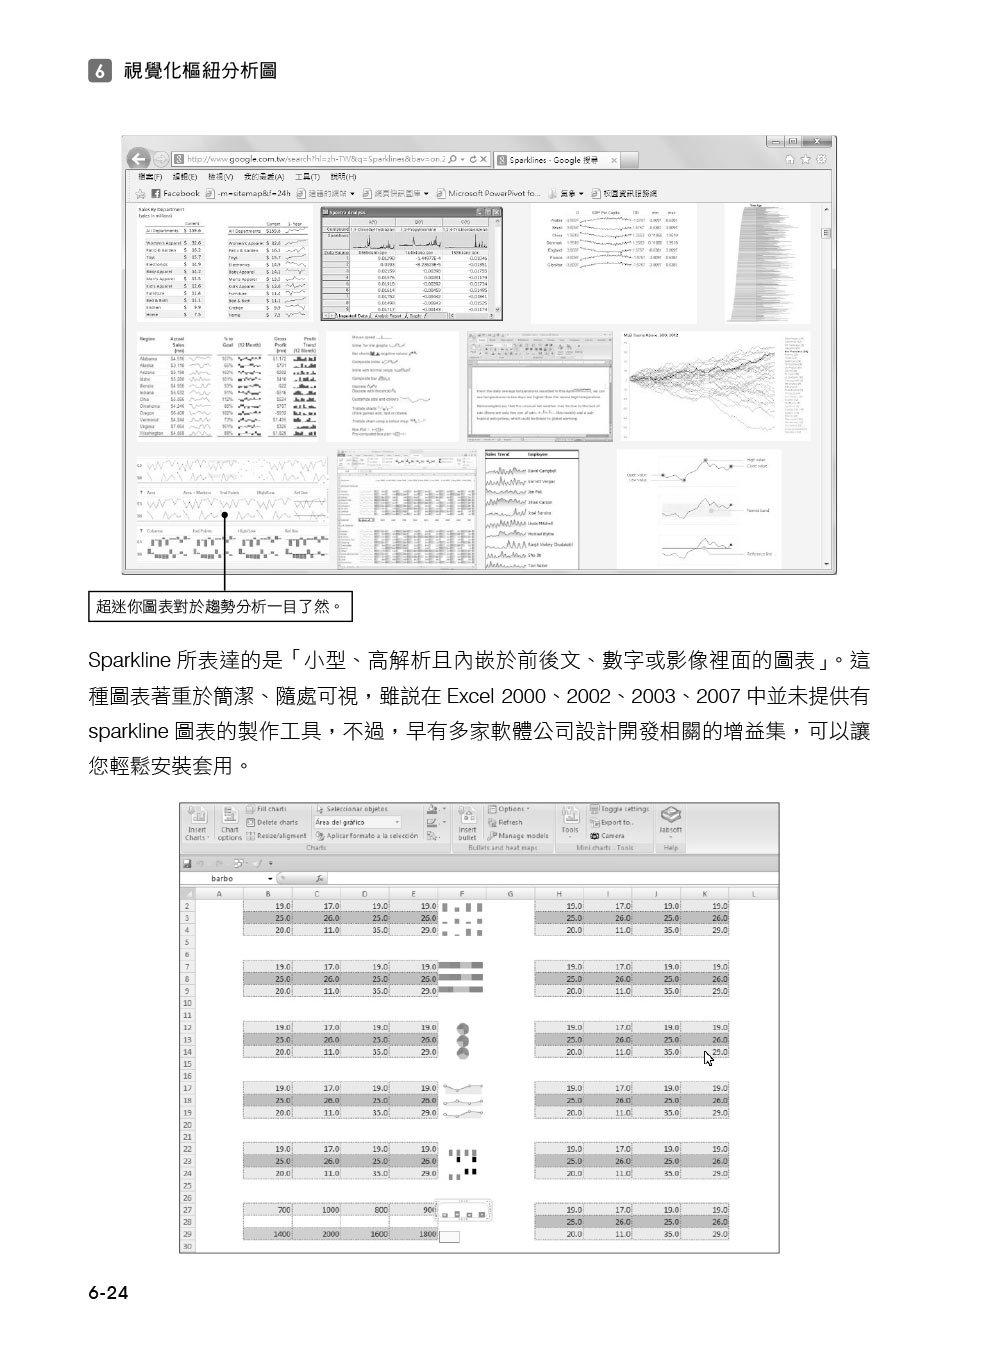 Excel 商業智慧分析|樞紐分析x大數據分析工具 PowerPivot 及 PowerView (適用Office 365/2013/2016/2019)-preview-7